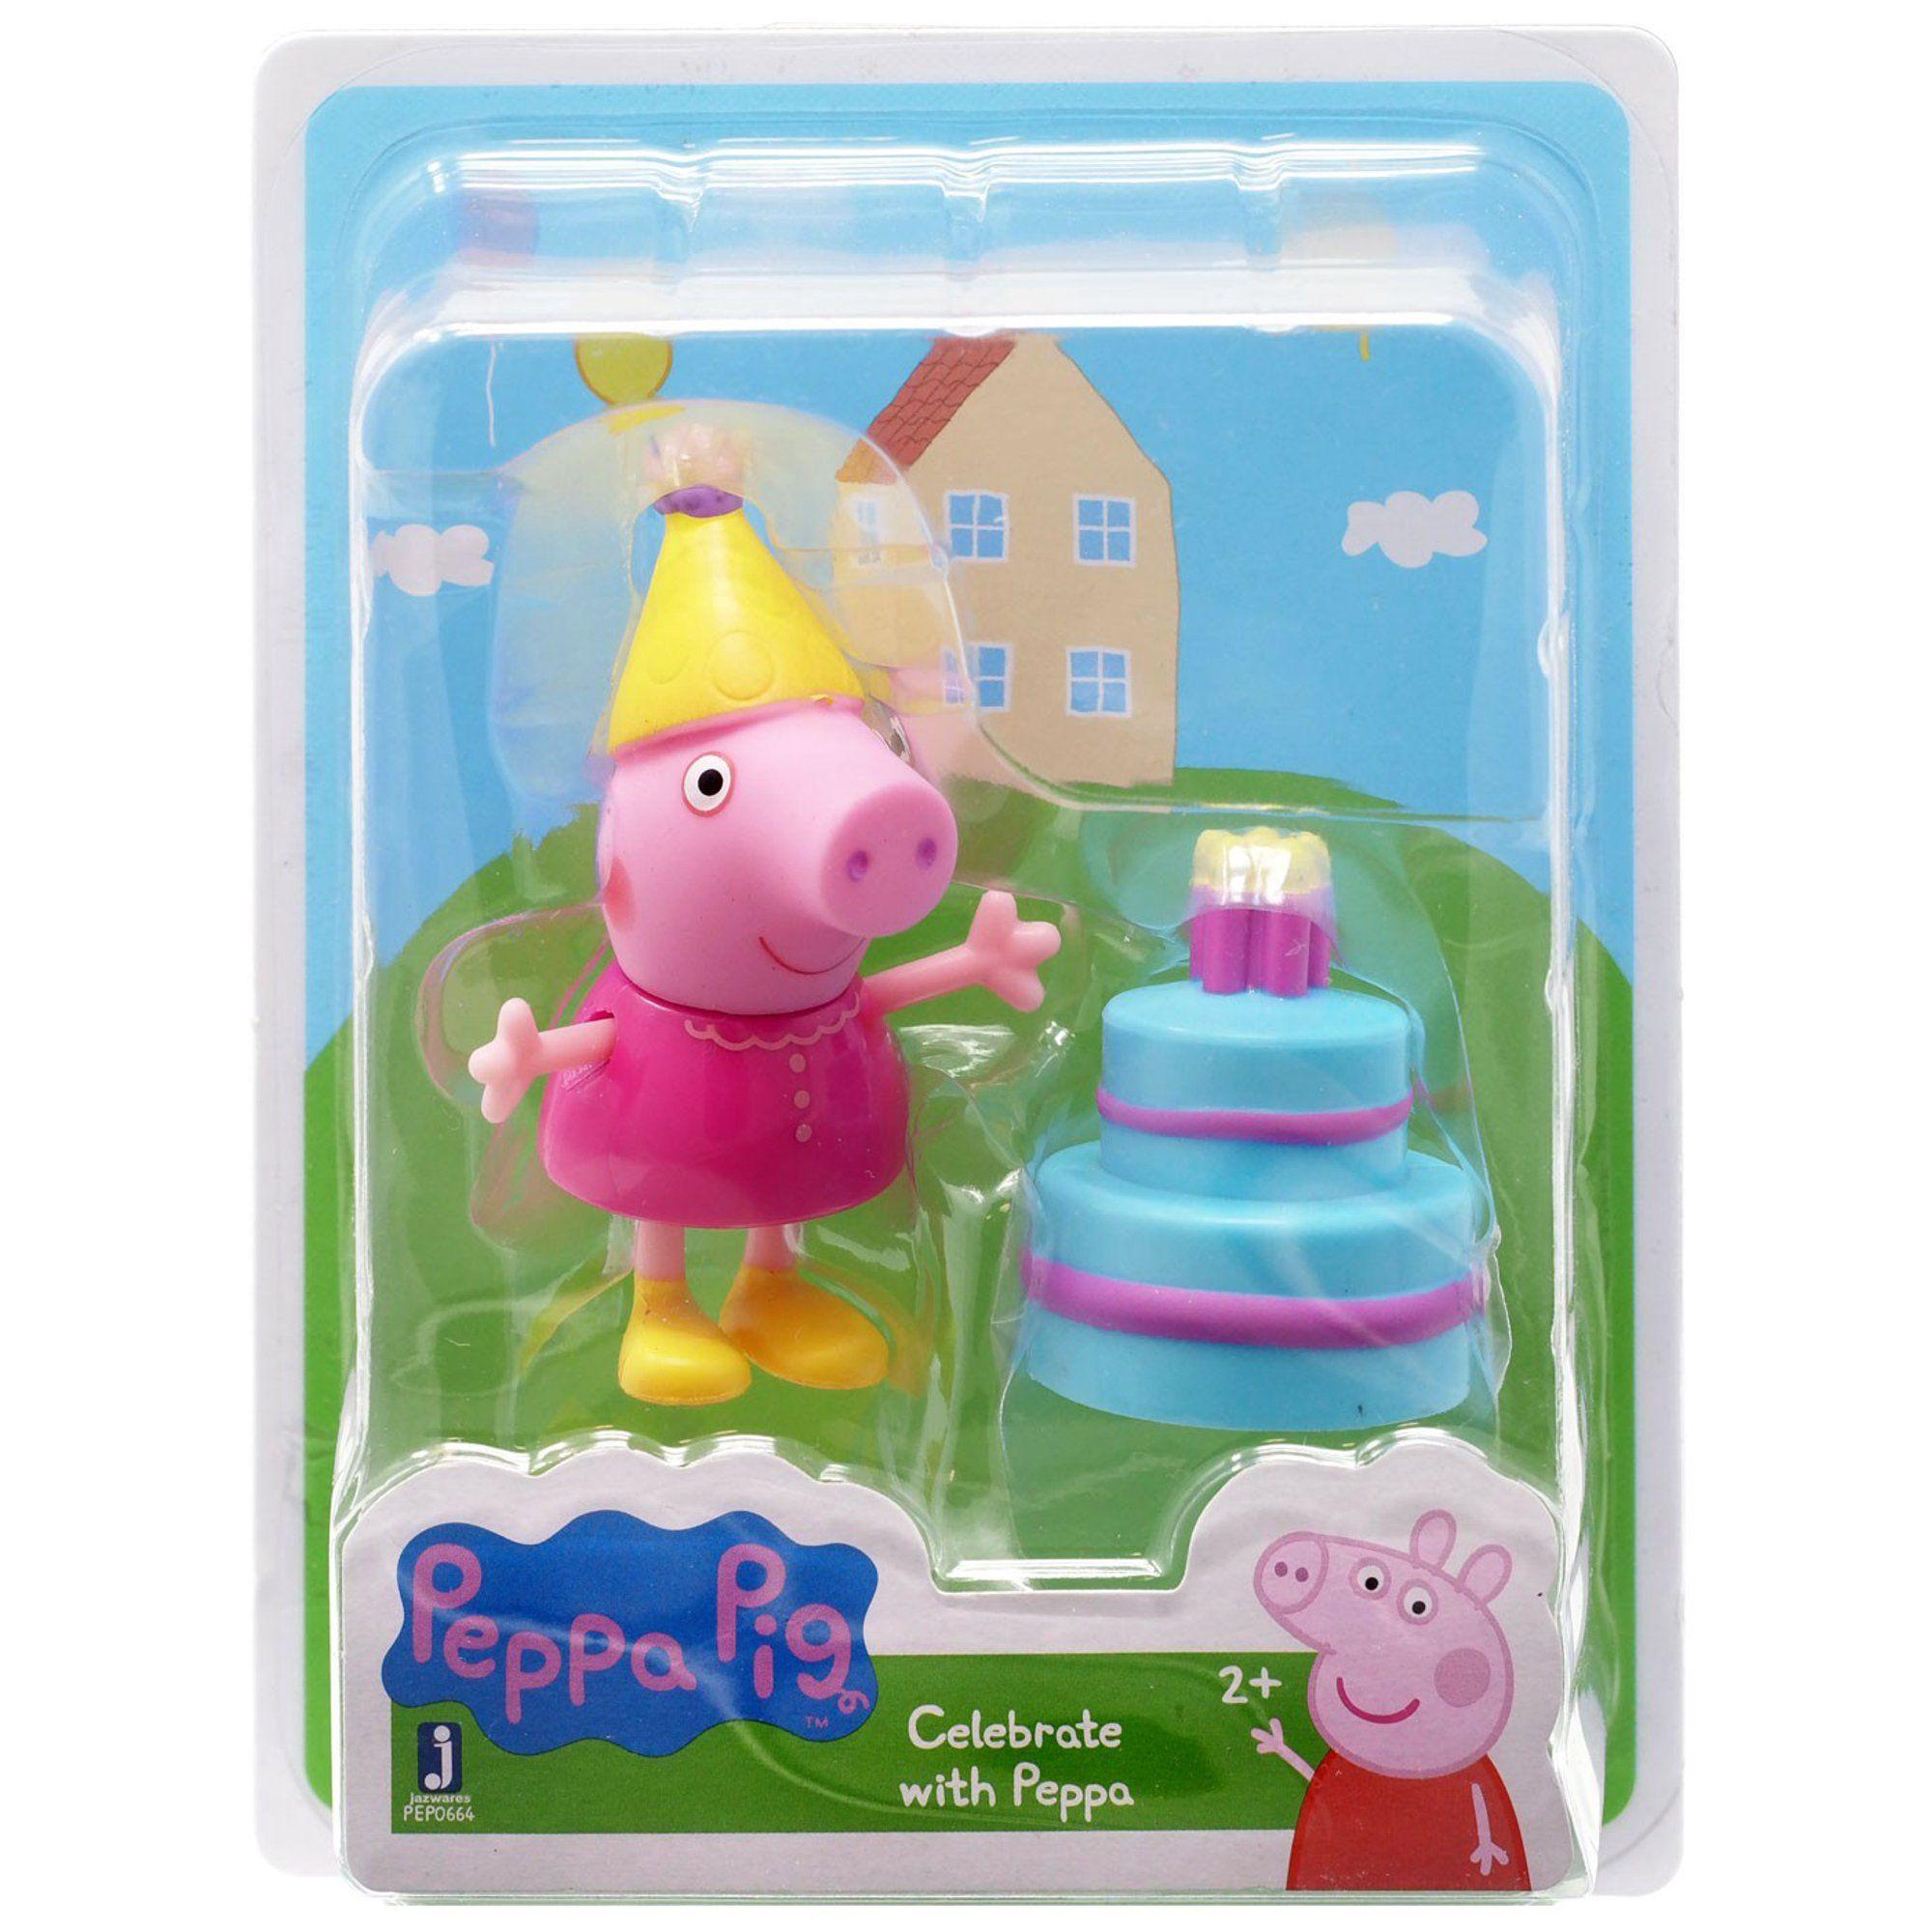 Peppa pig celebrate with peppa mini figure